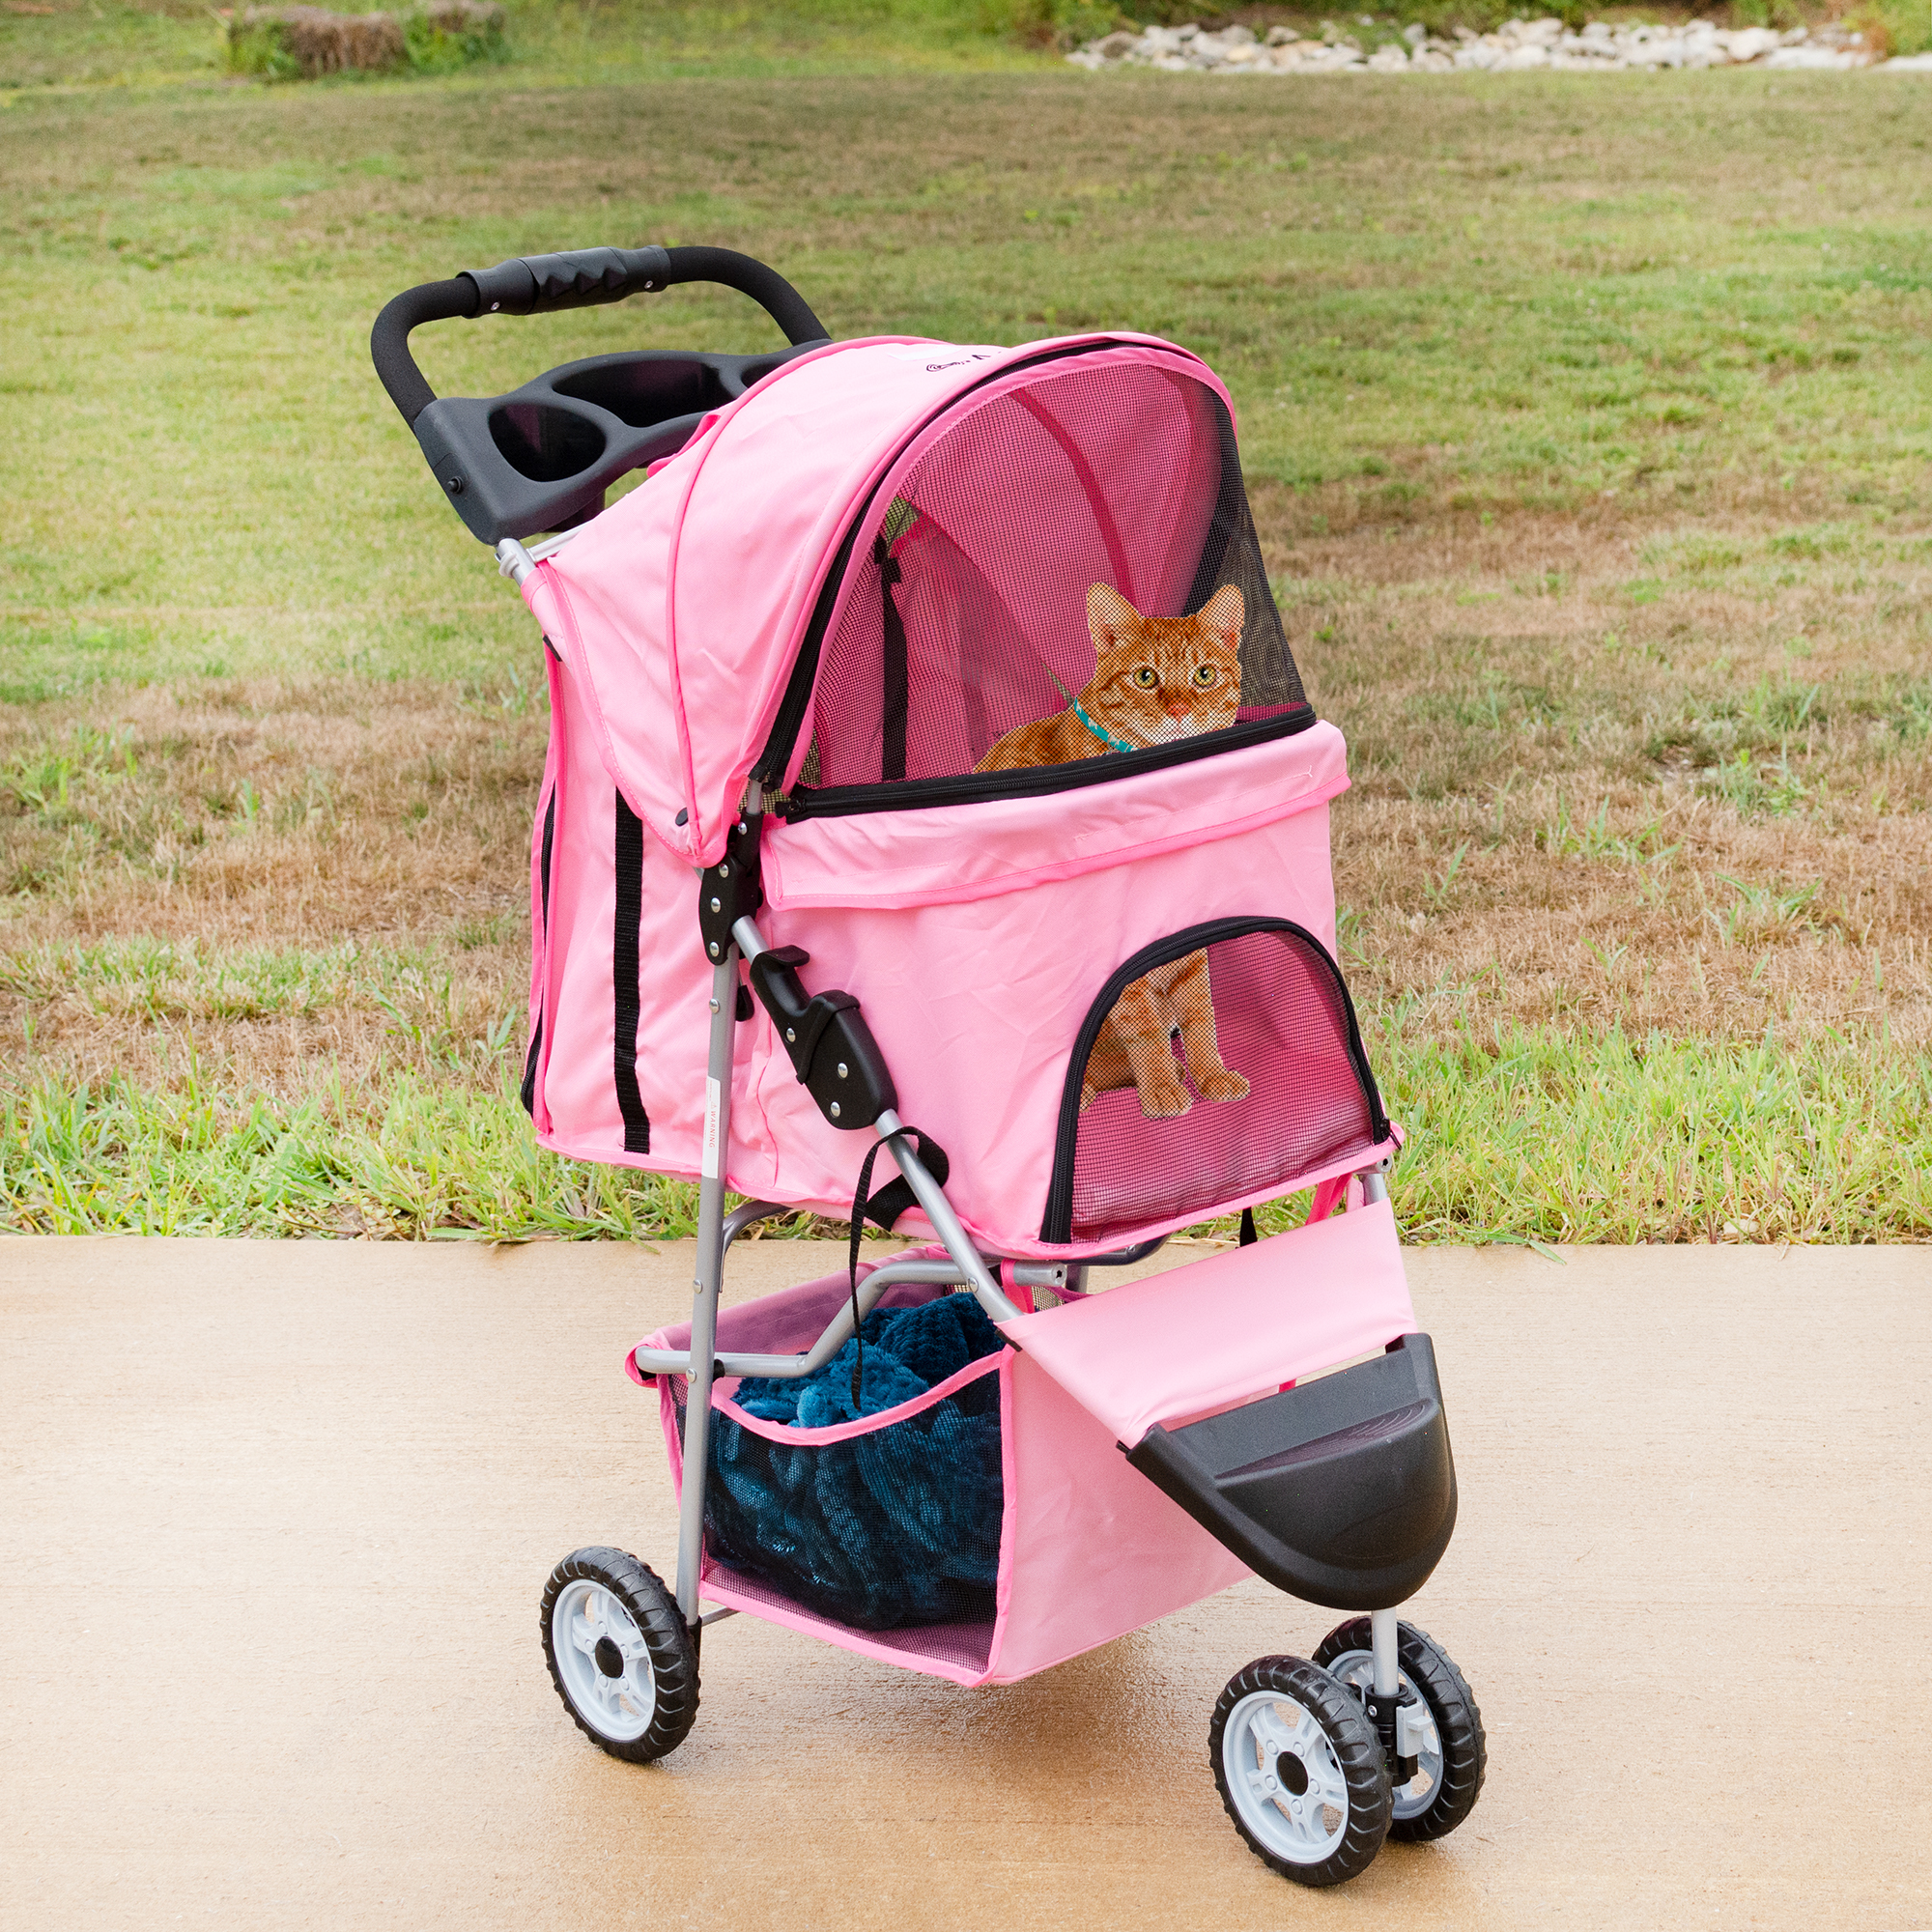 thumbnail 20 - VIVO Three Wheel Pet Stroller / Cat & Dog Foldable Carrier Strolling Cart